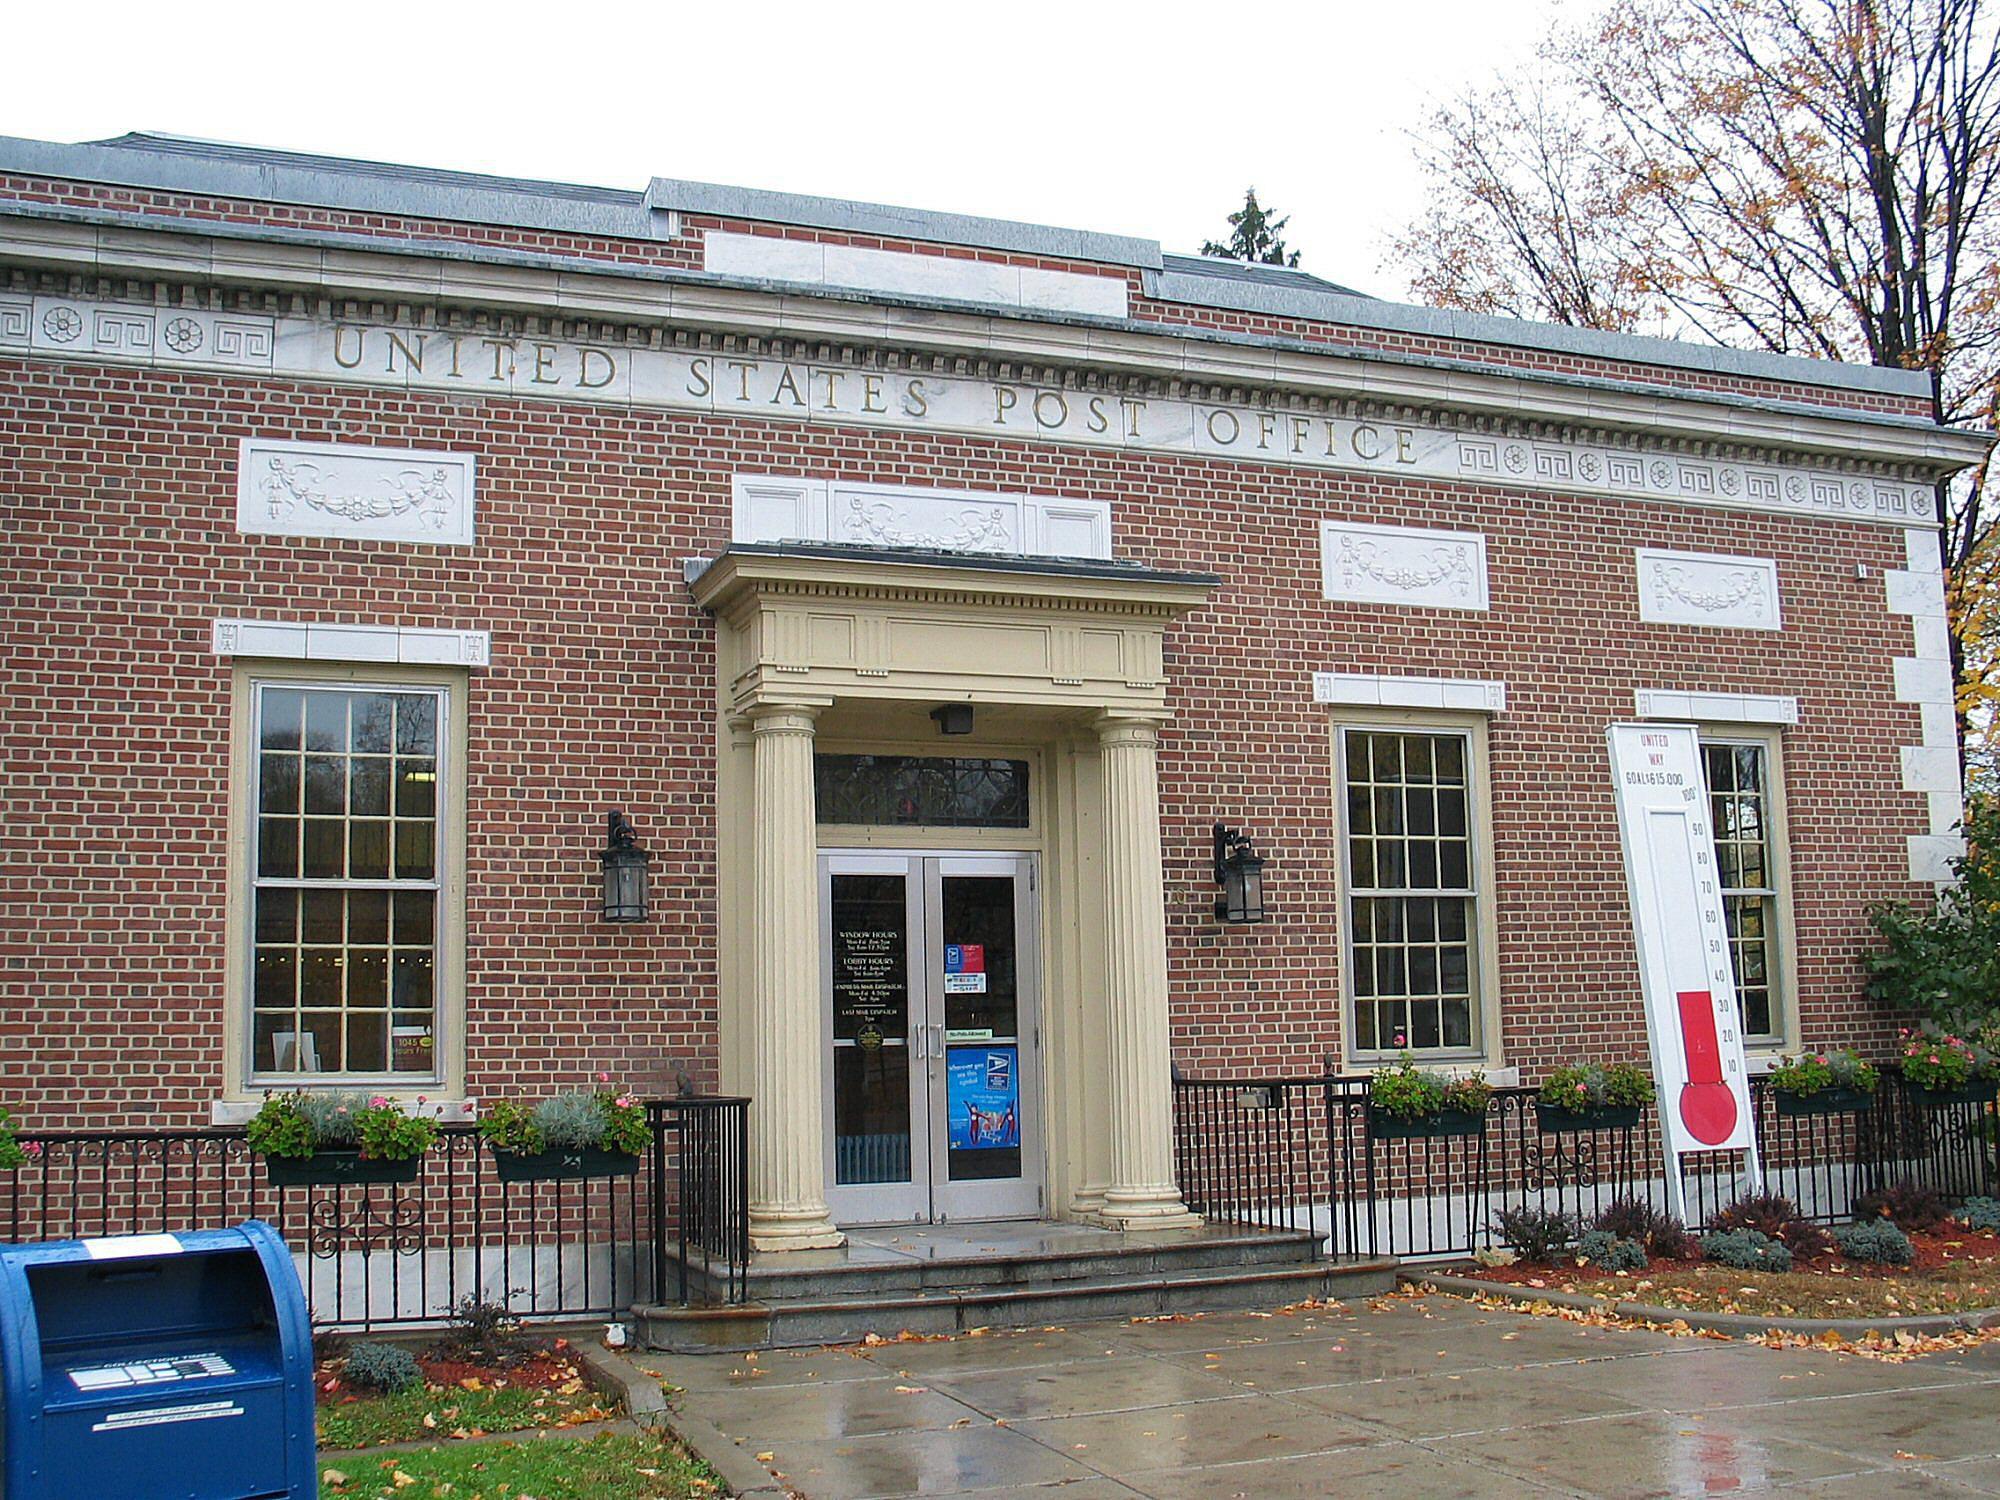 Photograph of ordinary brick postal building, 12-over-12 windows, small classical portico.